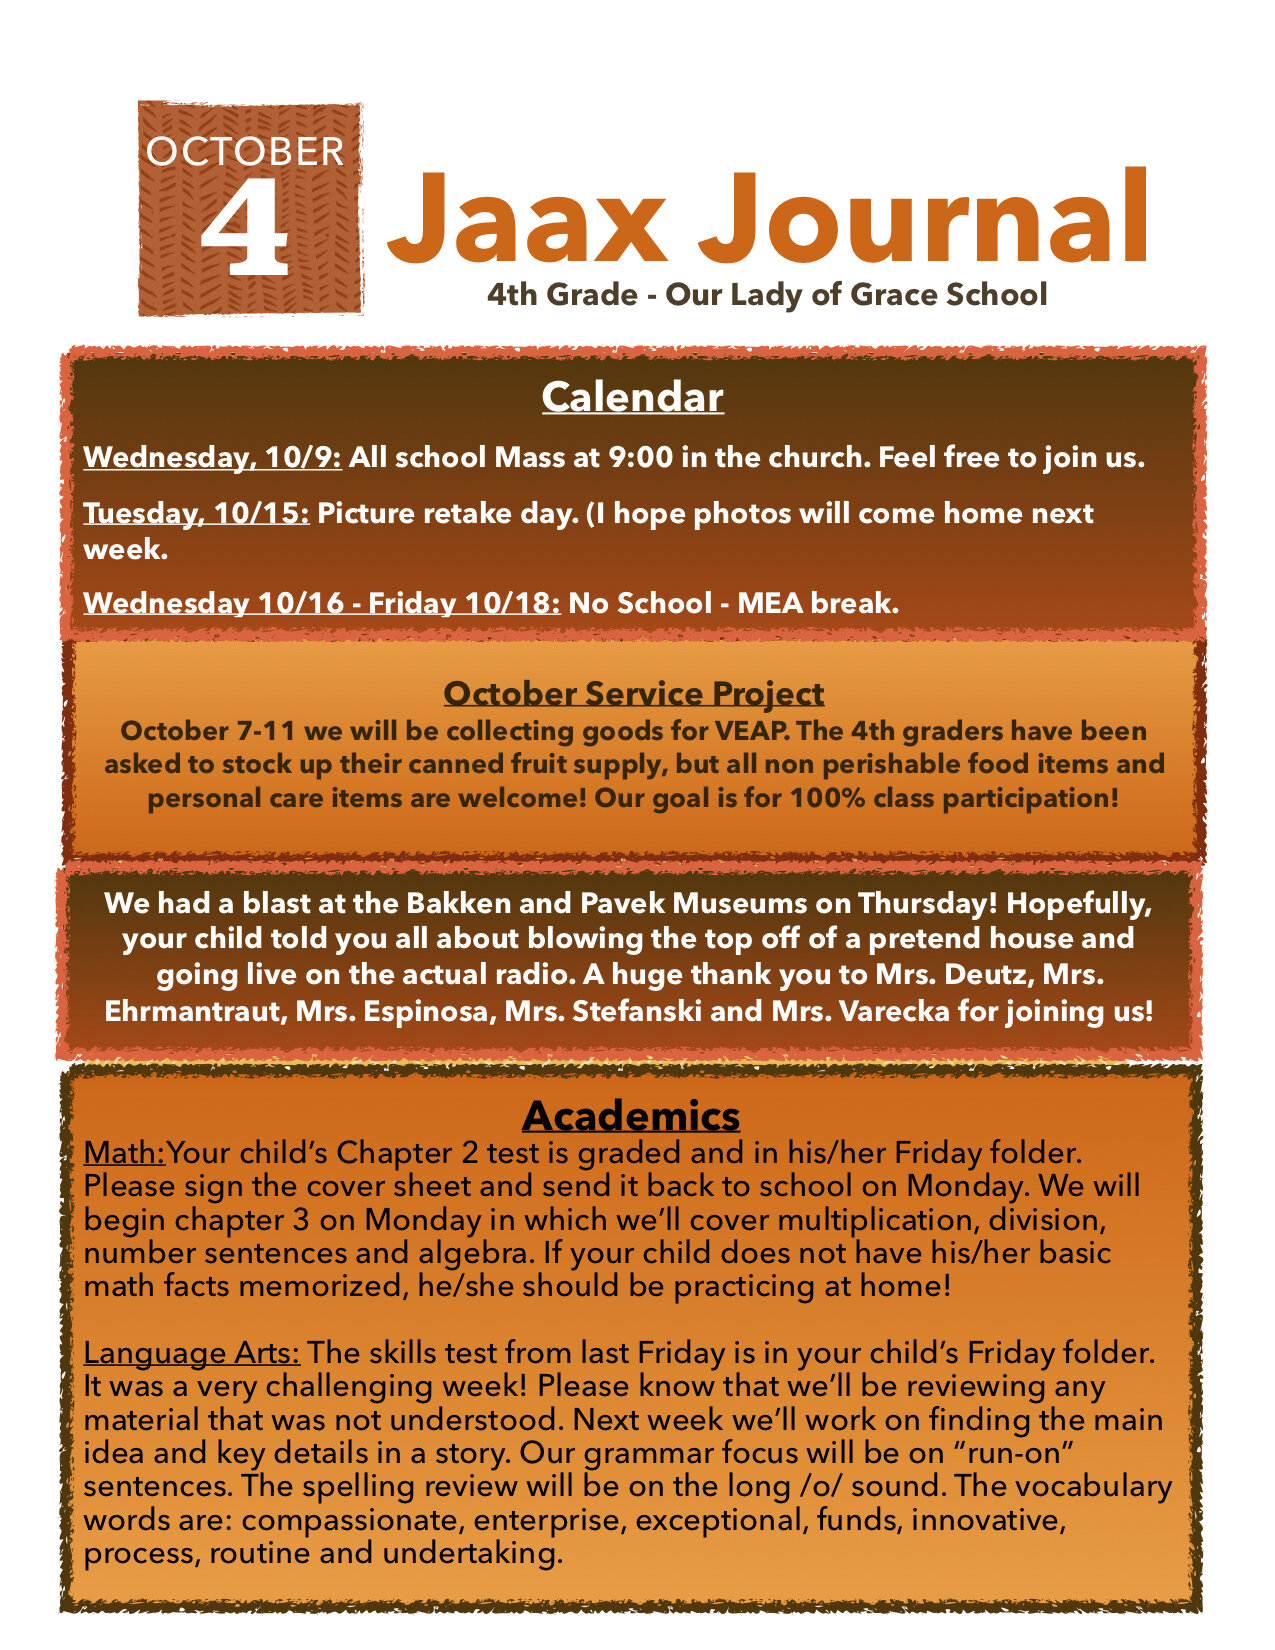 JaaxJournal10-4-19.jpg